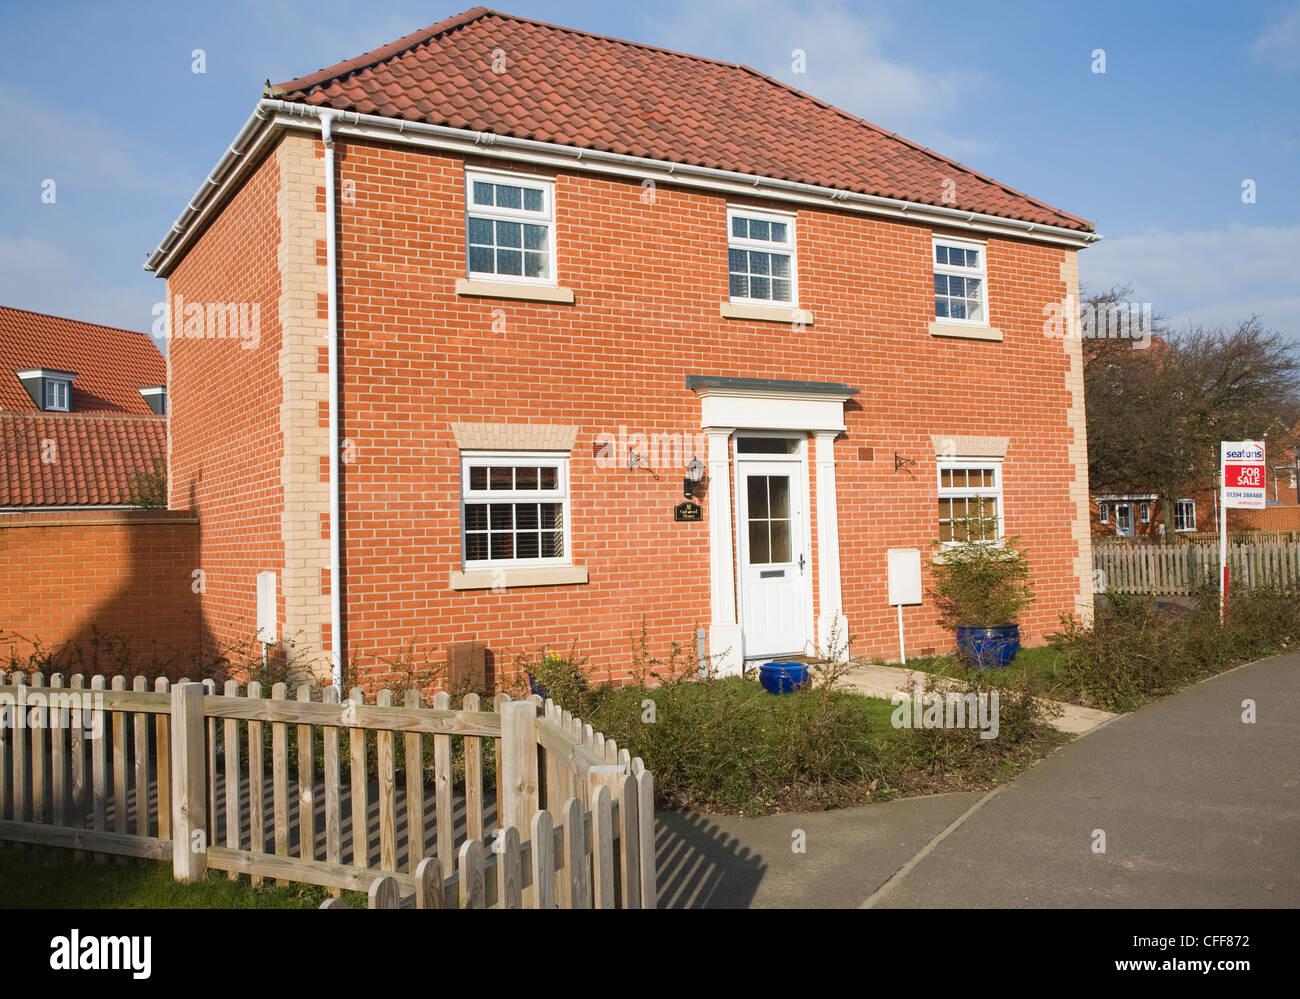 Detached new house for sale Rendlesham, near Woodbridge, Suffolk - Stock Image